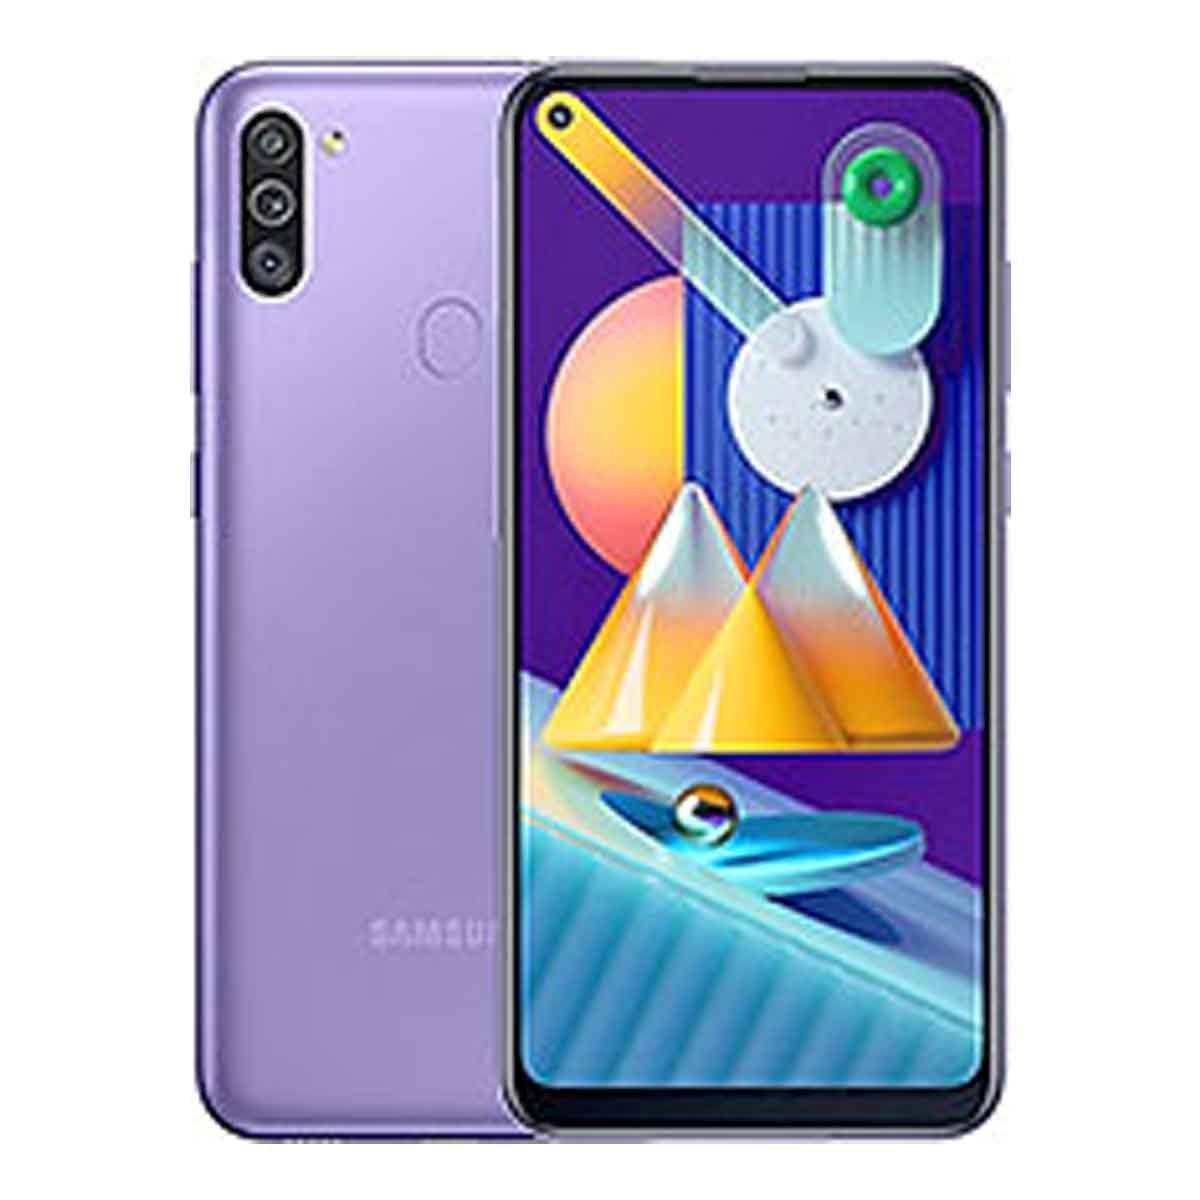 Samsung Galaxy M11 (3-32)